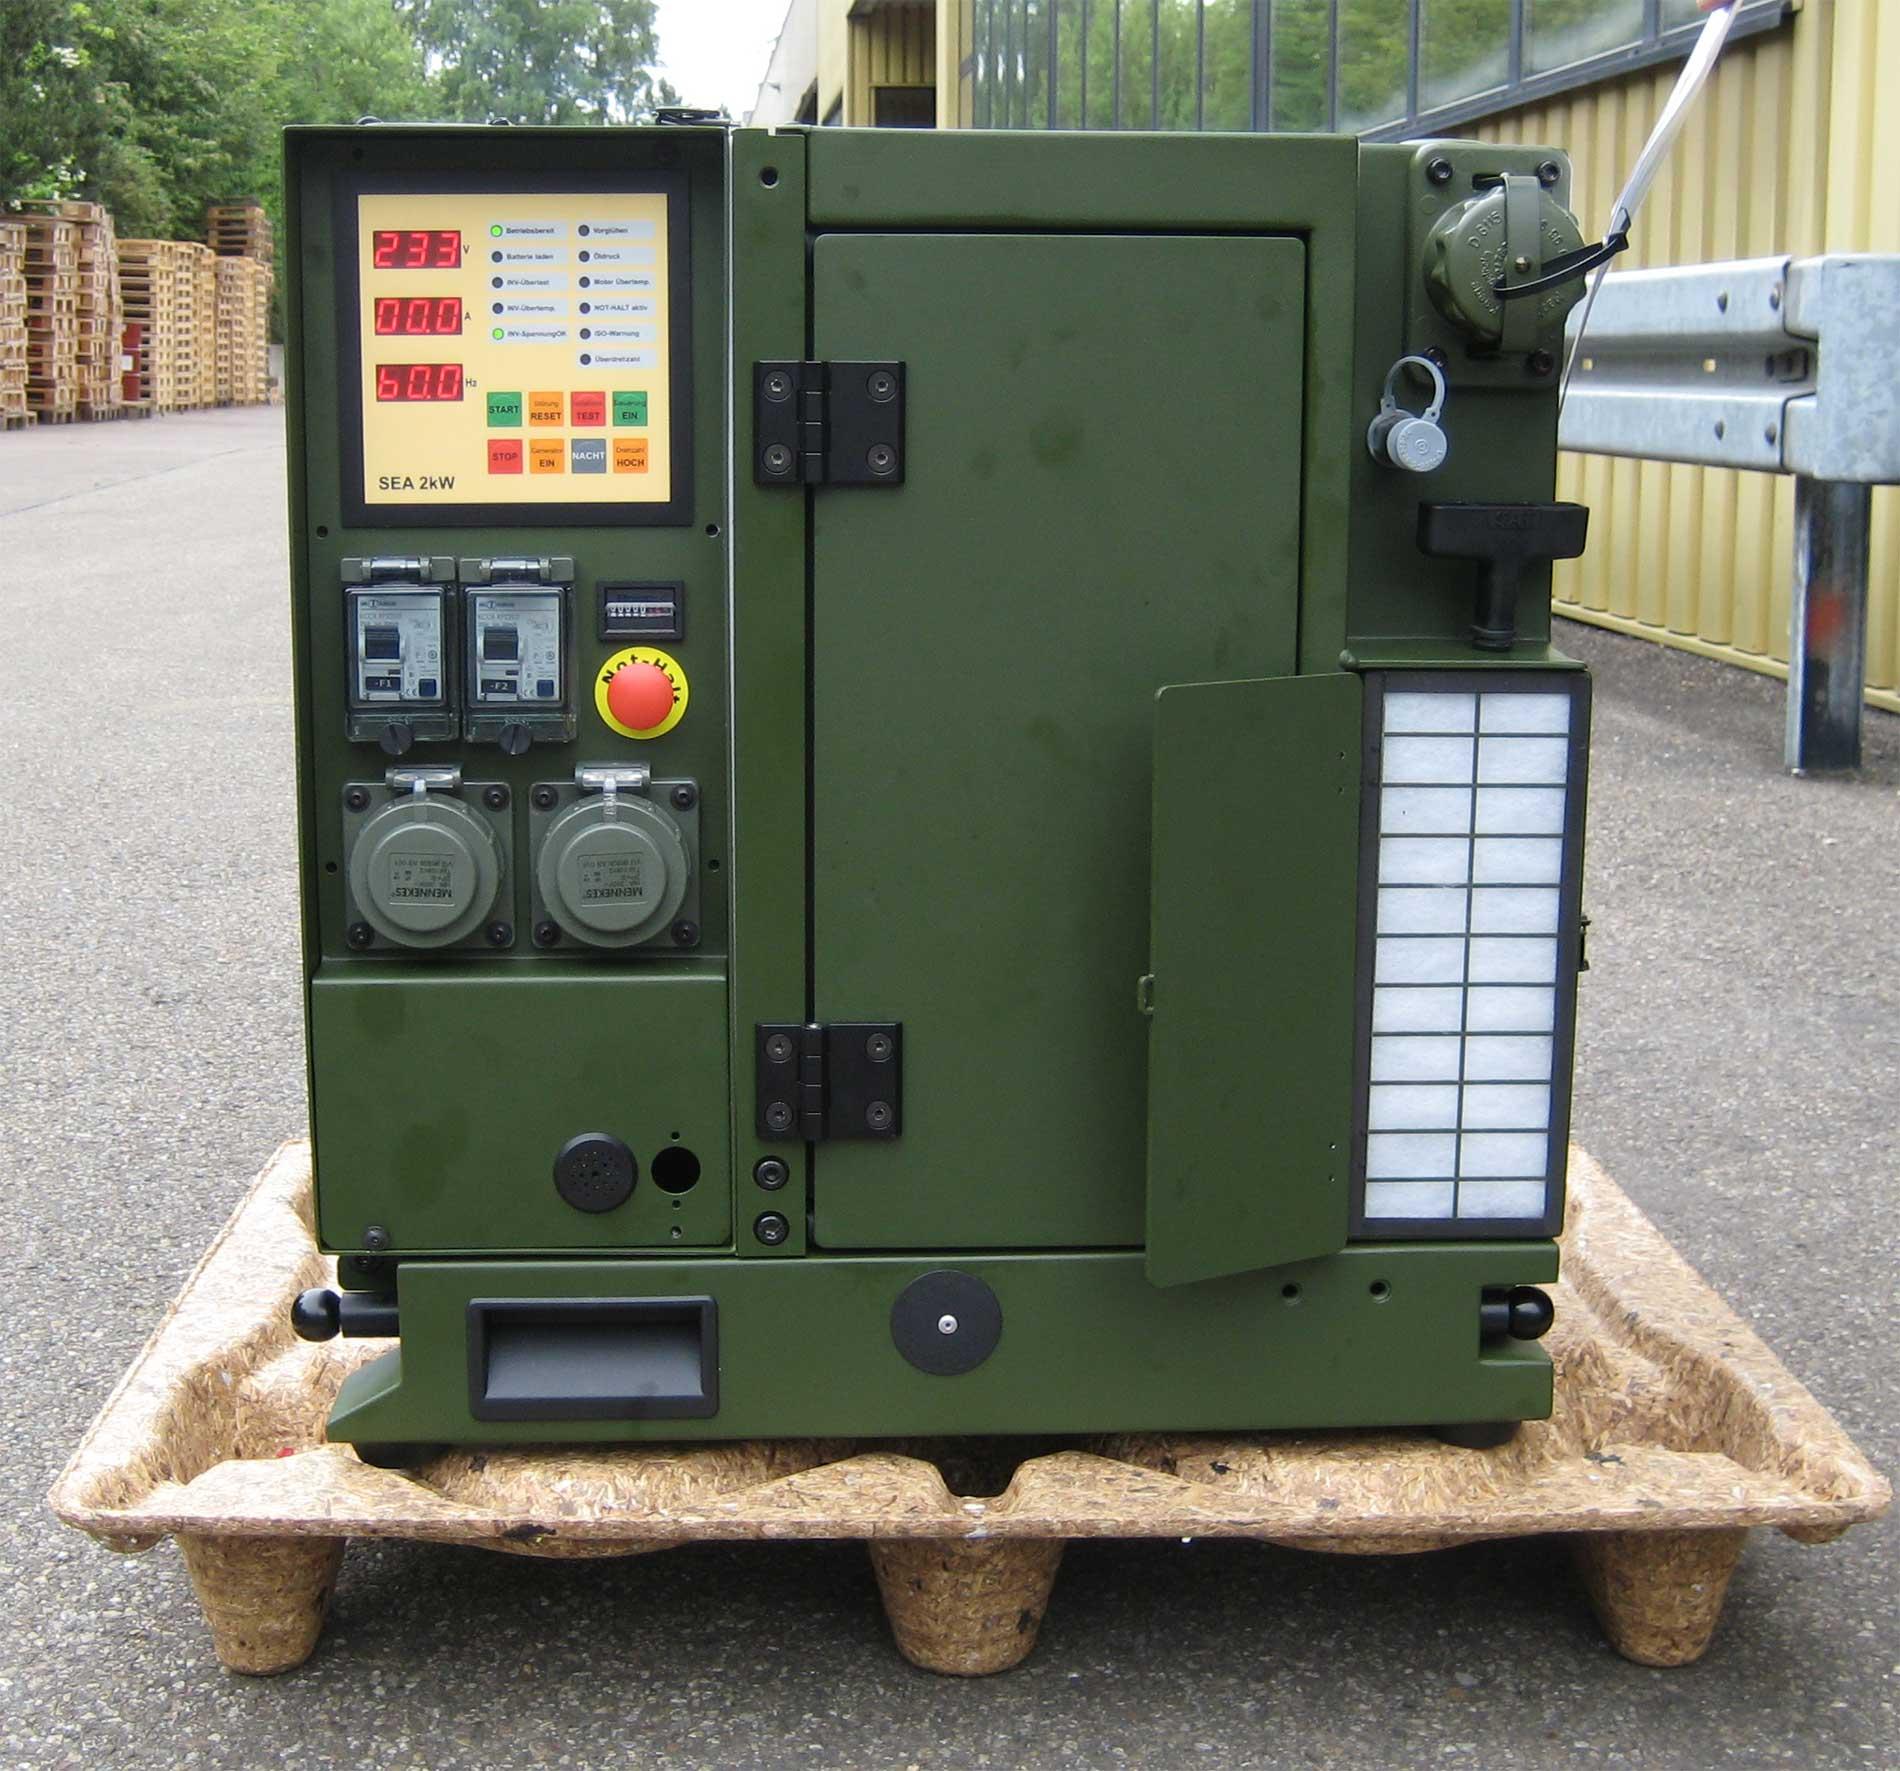 IRON DOME IDF - גנרטור בשרות כיפת ברזל